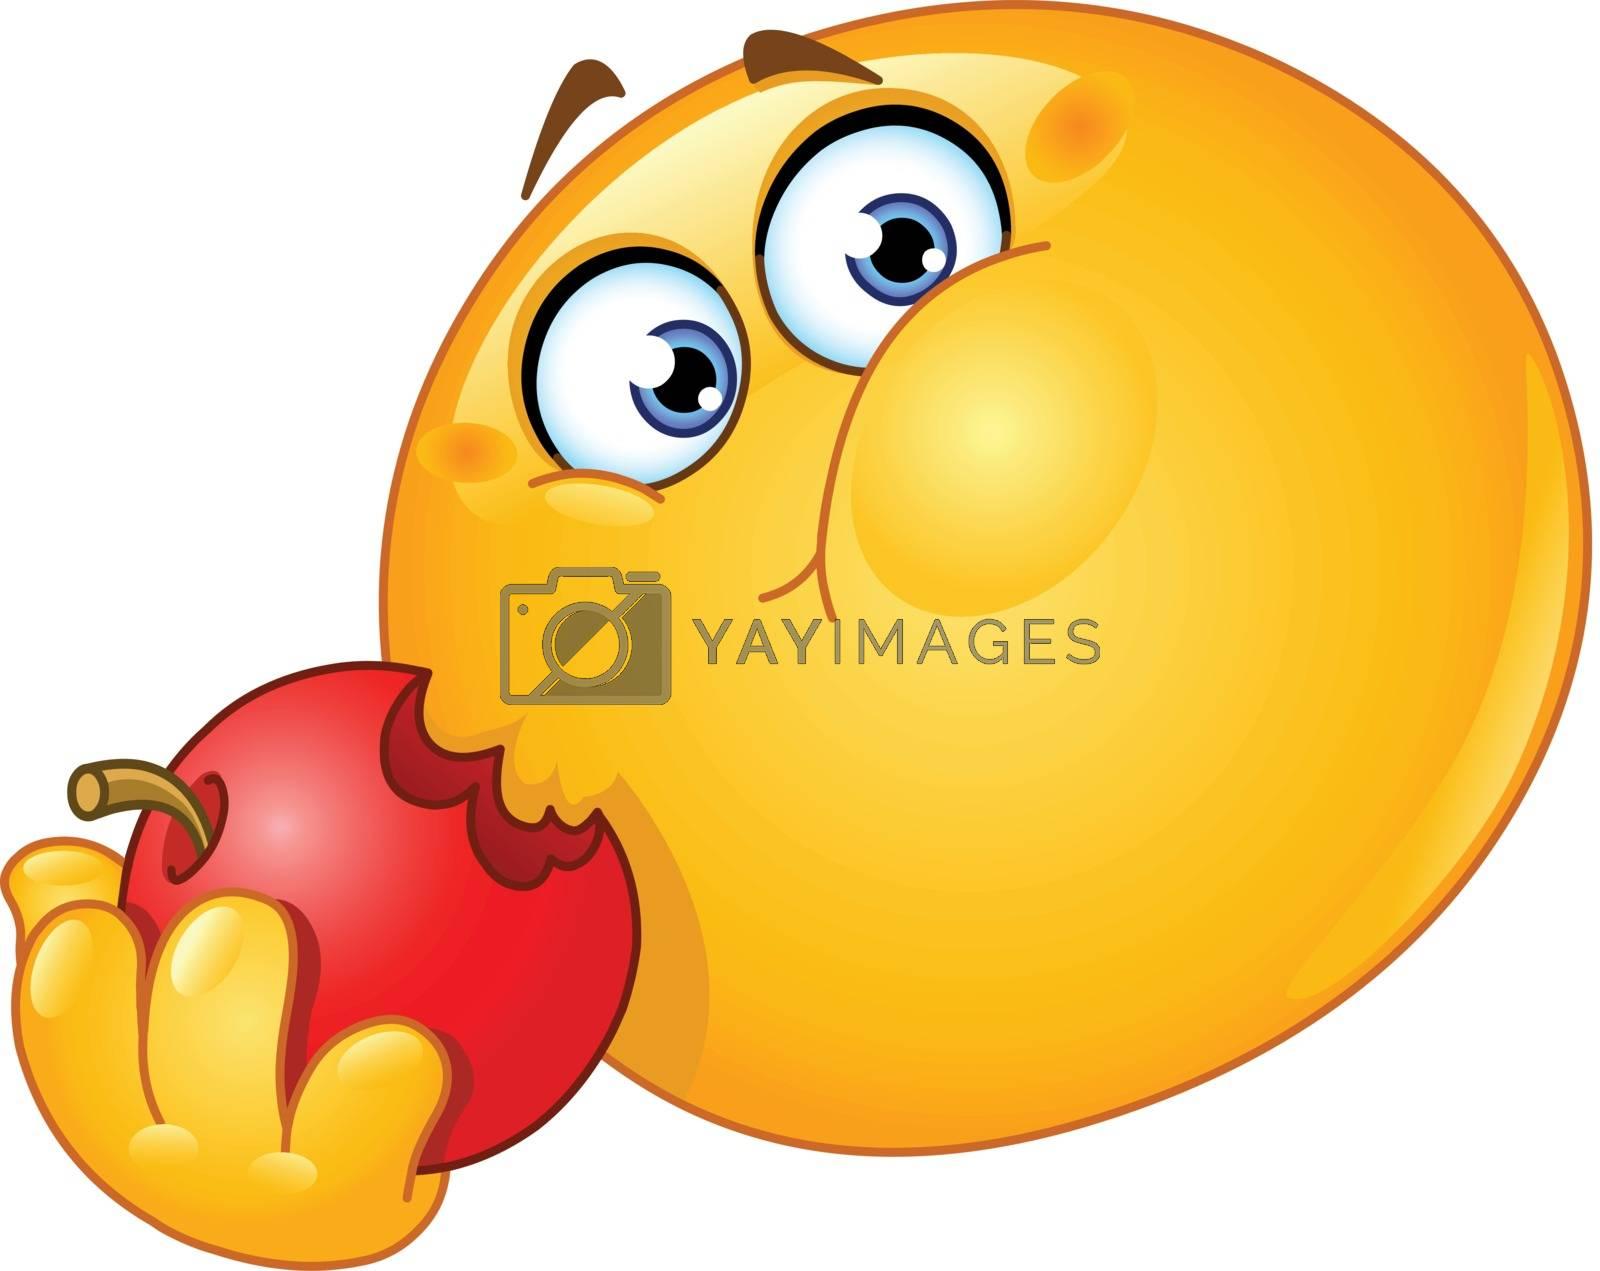 Royalty free image of Emoticon eating apple by yayayoyo